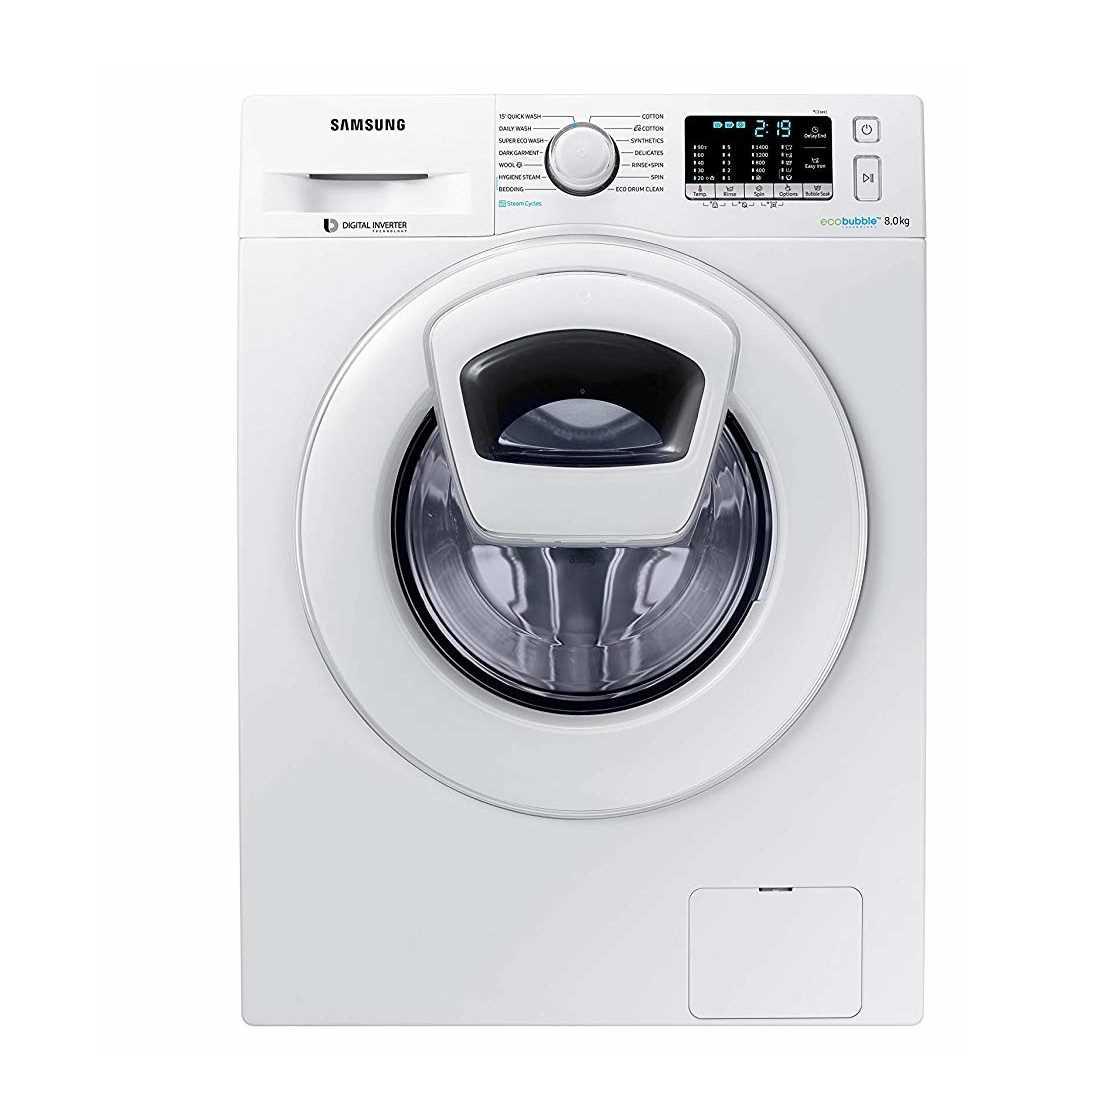 Samsung WW80K54E0WW 8 Kg Fully Automatic Front Loading Washing Machine